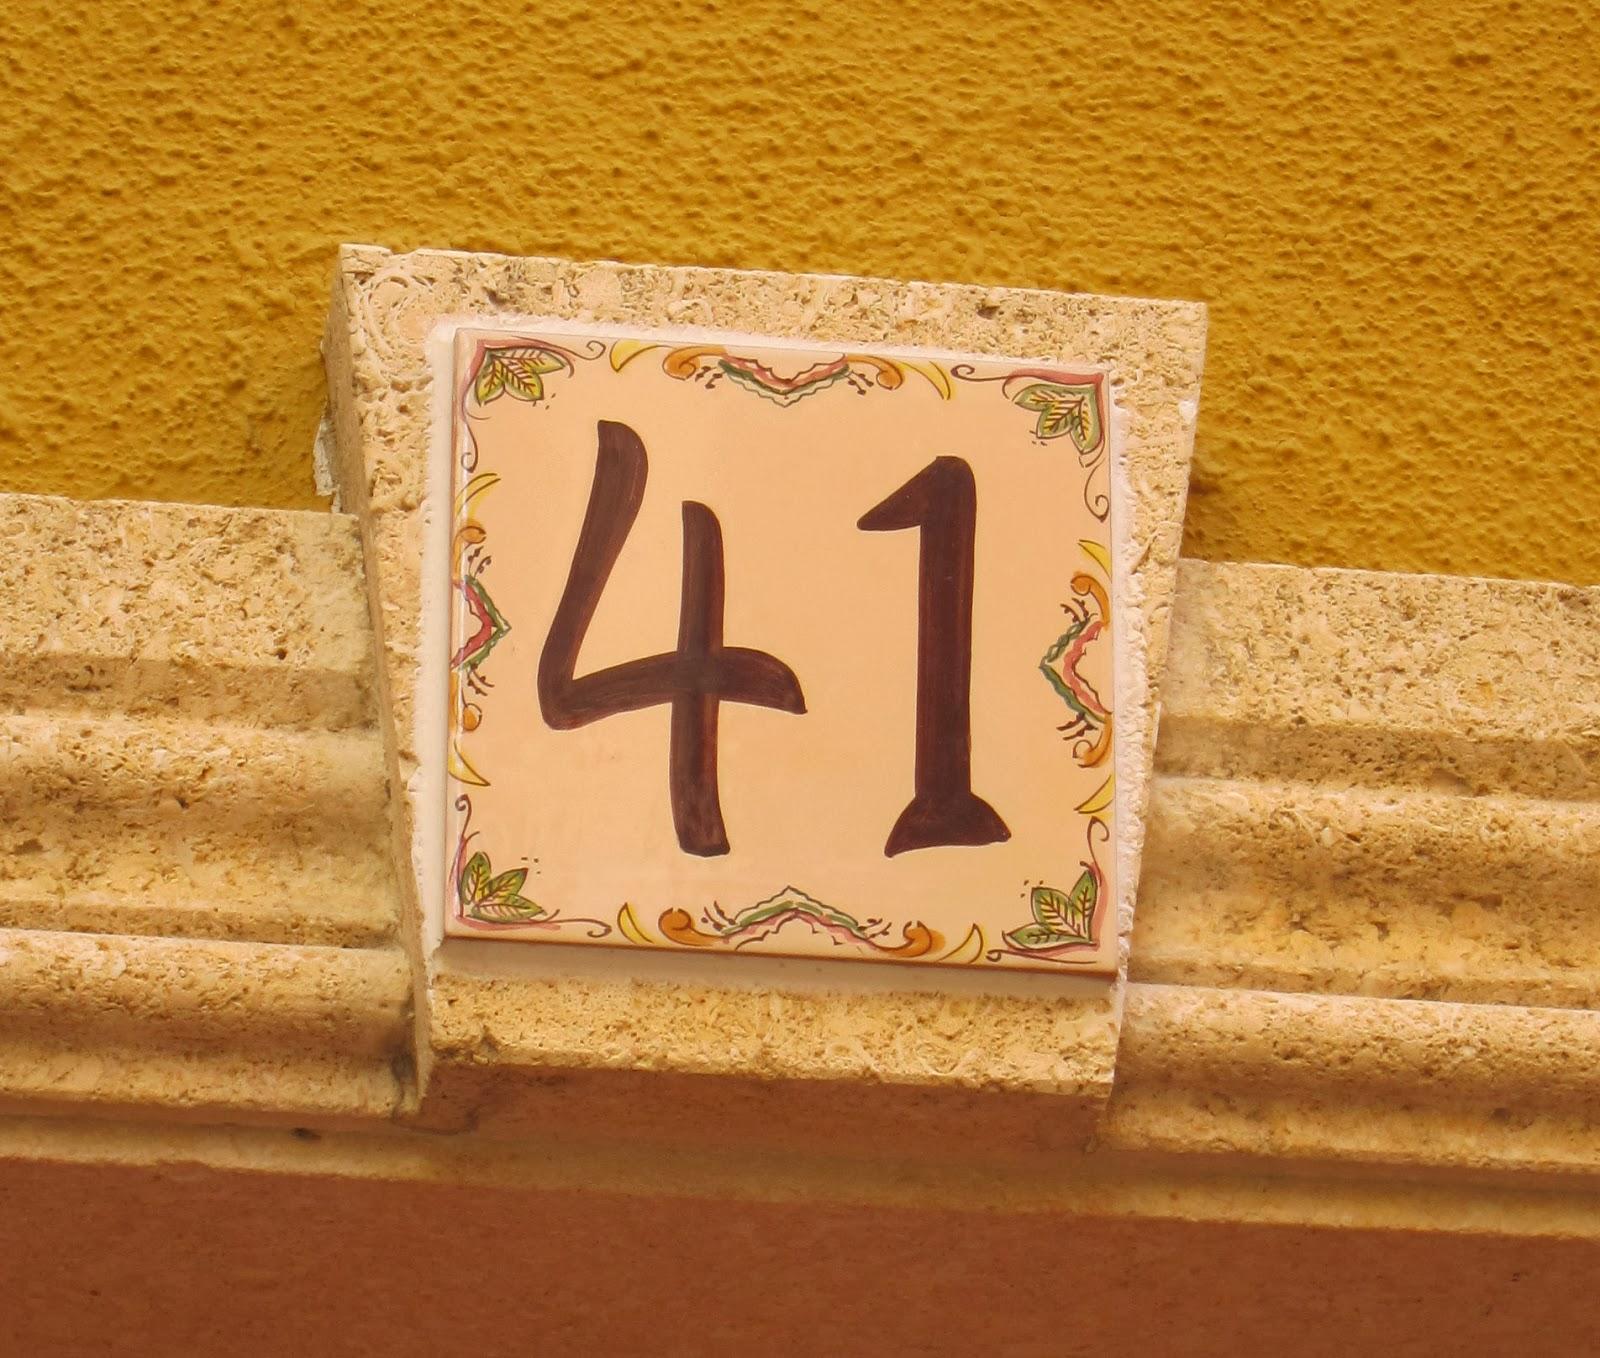 Apiarium azulejos con n mero de casa ii for Azulejo numero casa